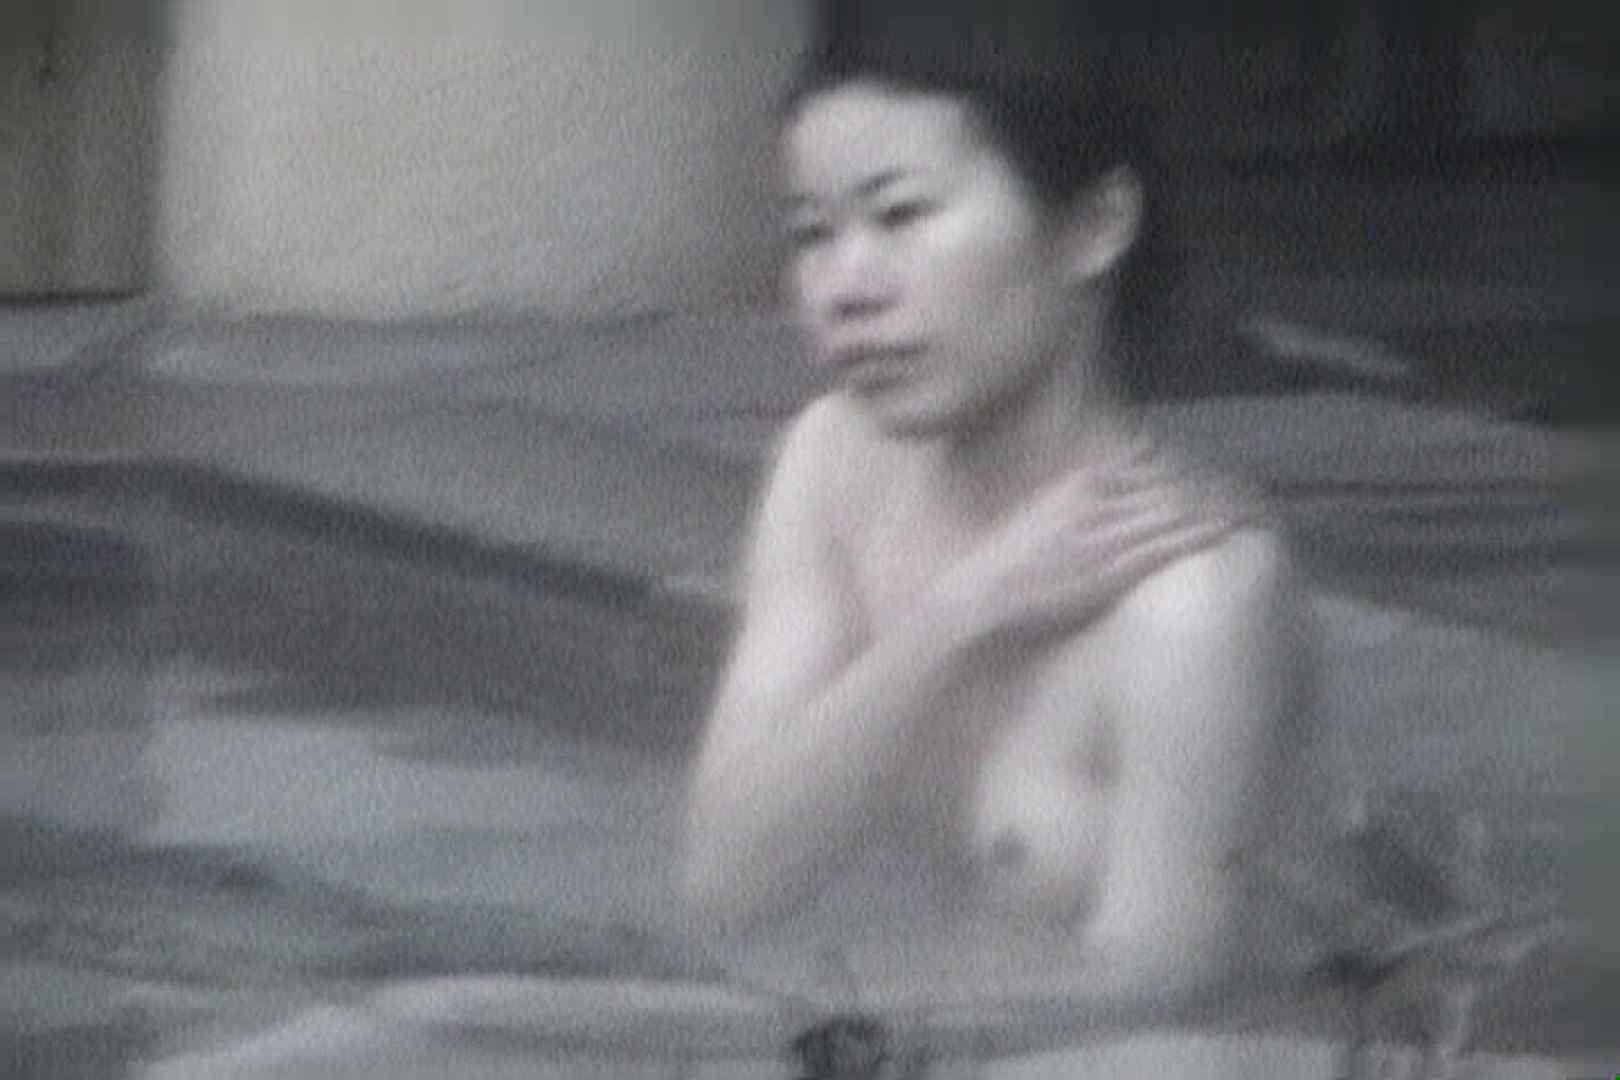 Aquaな露天風呂Vol.556 露天風呂編  99PIX 68